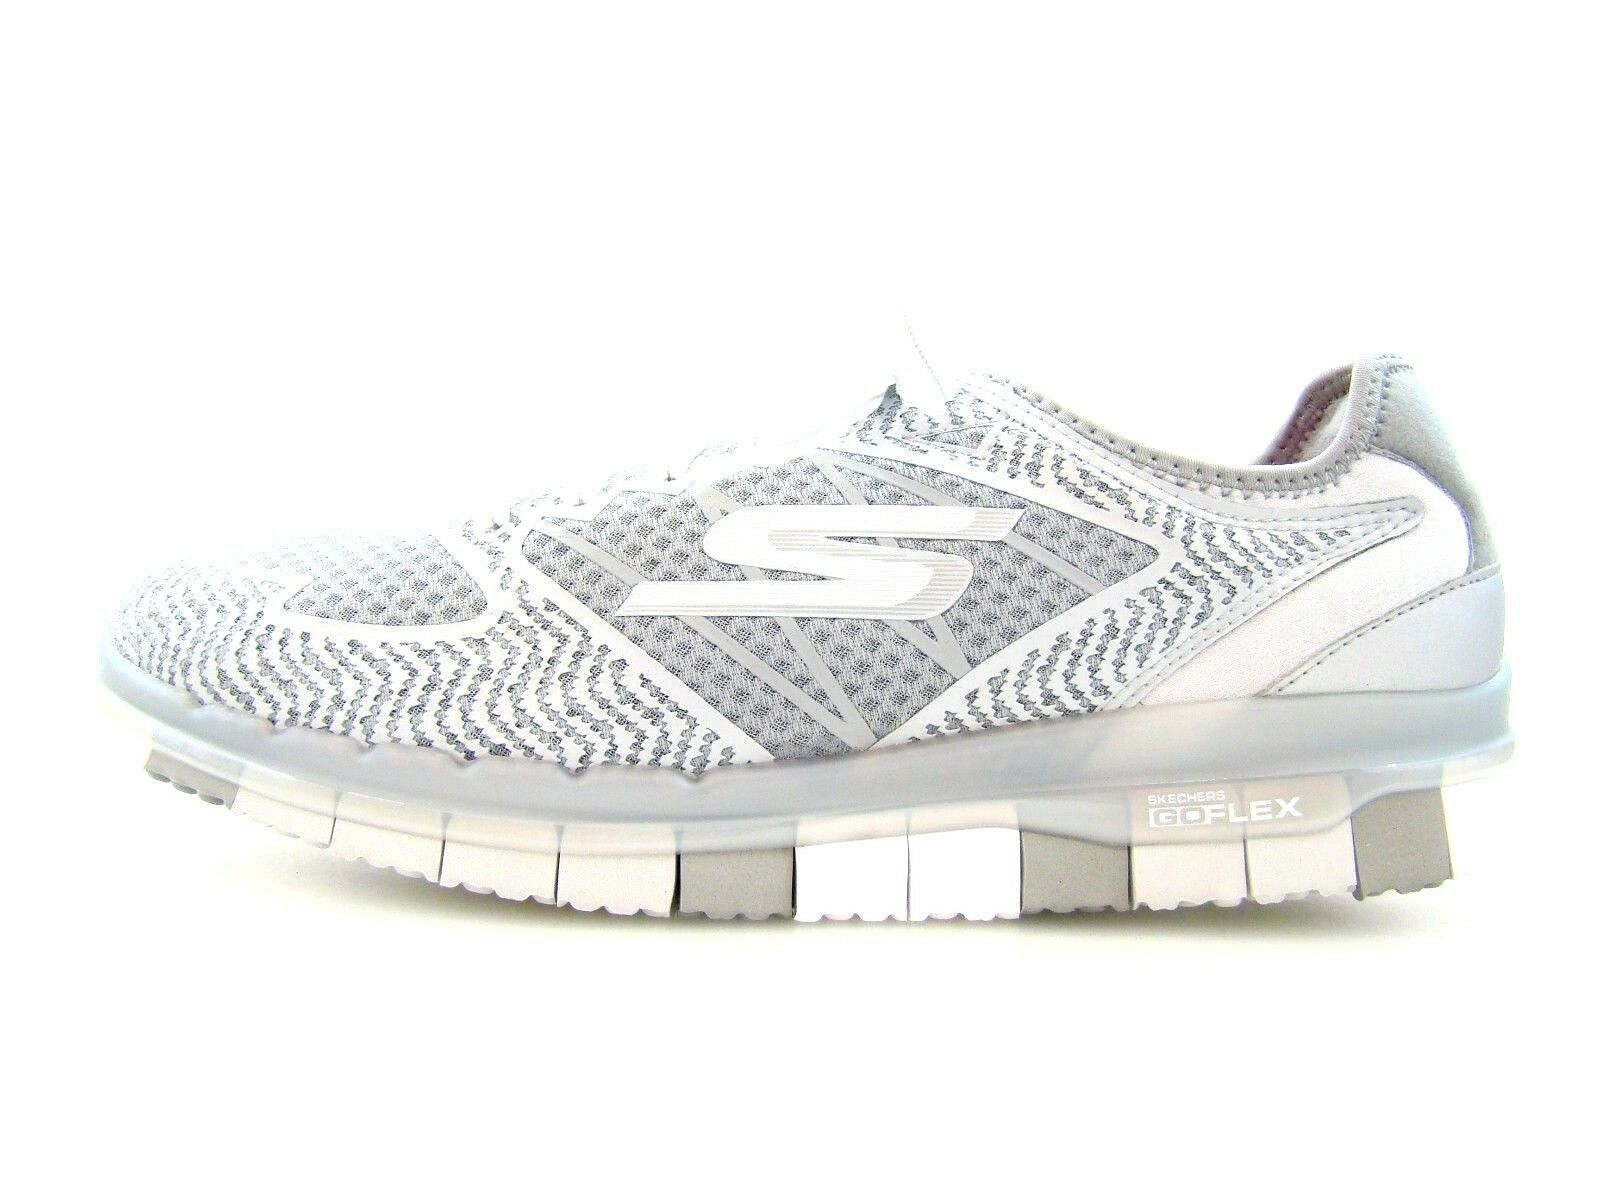 2826 Turnschuhe SKECHERS Sneaker 40 NEU Turnschuhe 2826 komfortabel flexible Sohle grau weiß b455d6